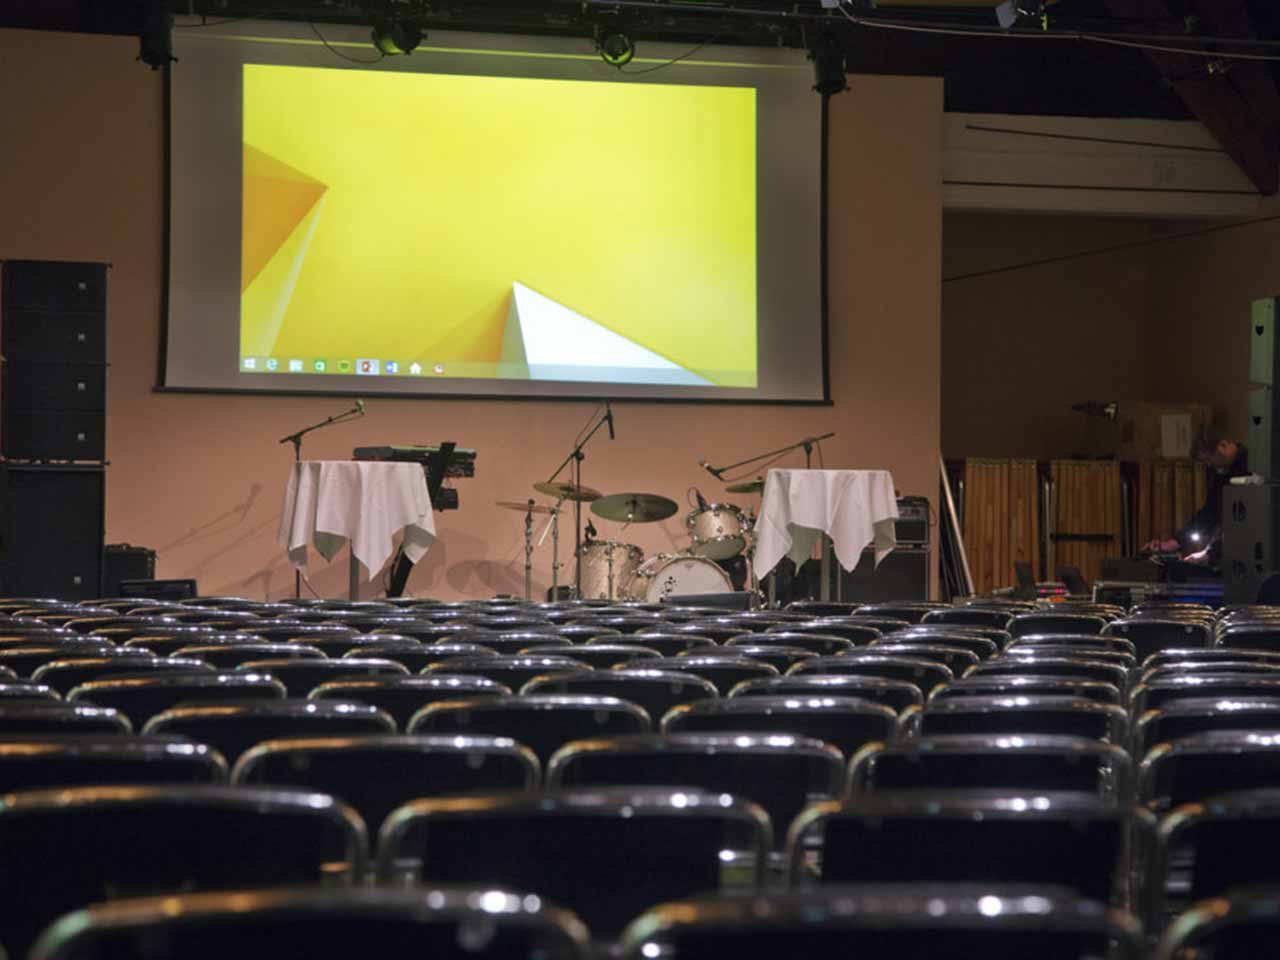 Scenkonstmuseet - Eventlokal Östermalm - Biosittning konferens